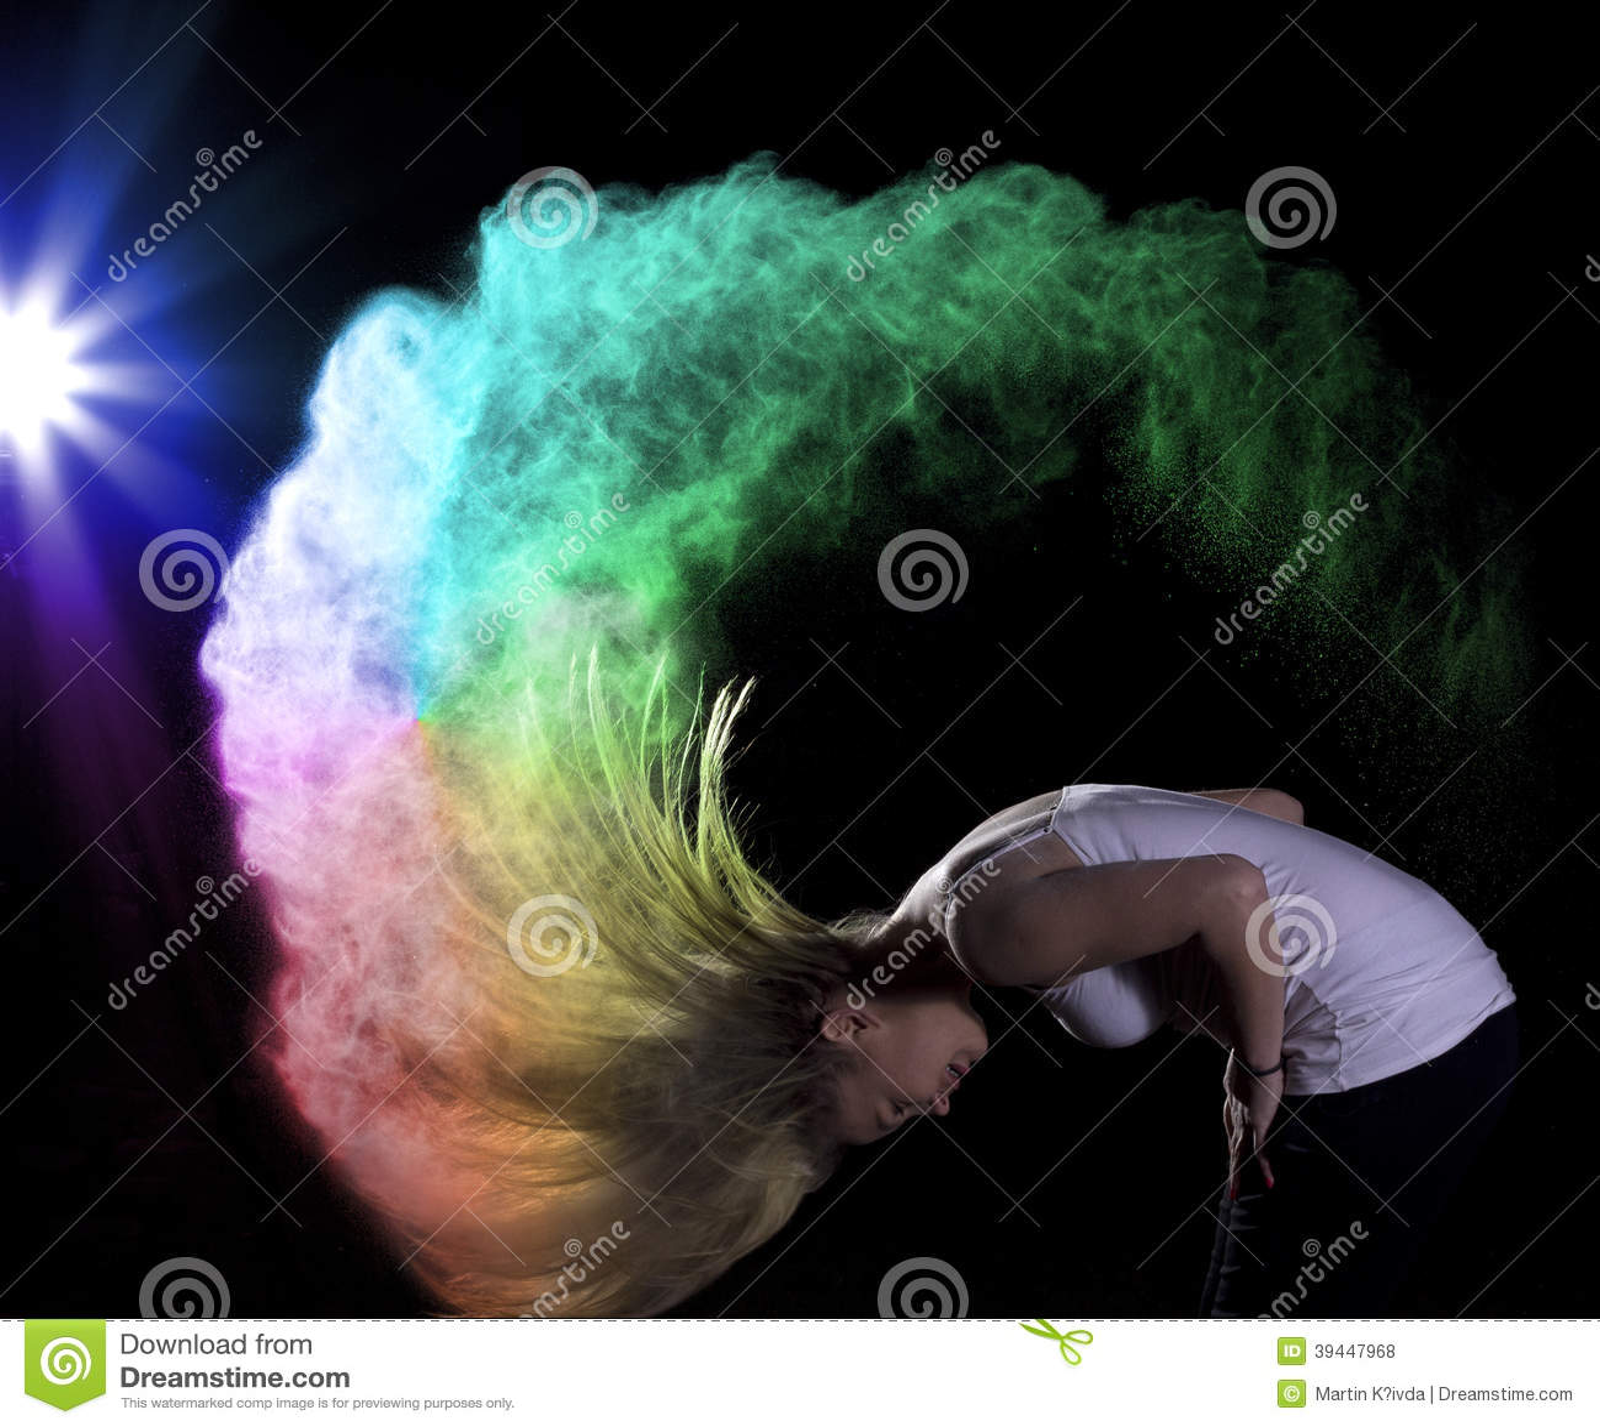 Colour Powder Photo Shoot Stock Photo Image 39447968